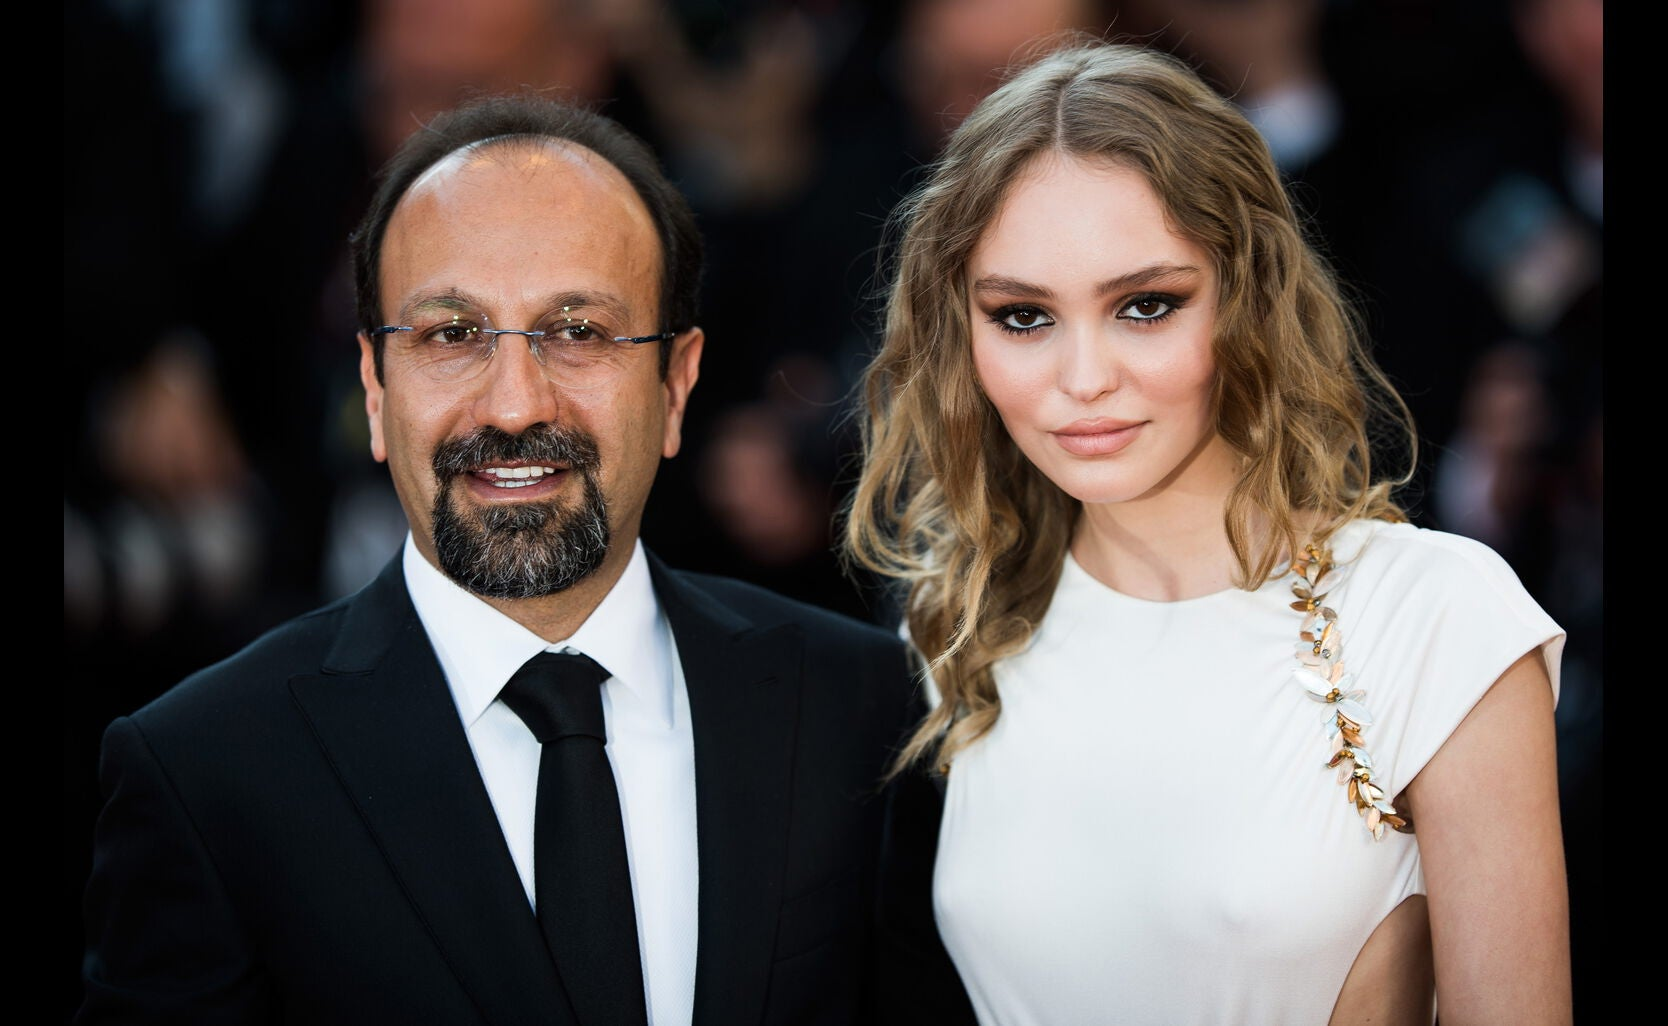 Lily-Rose Depp with Director Asghar Farhadi